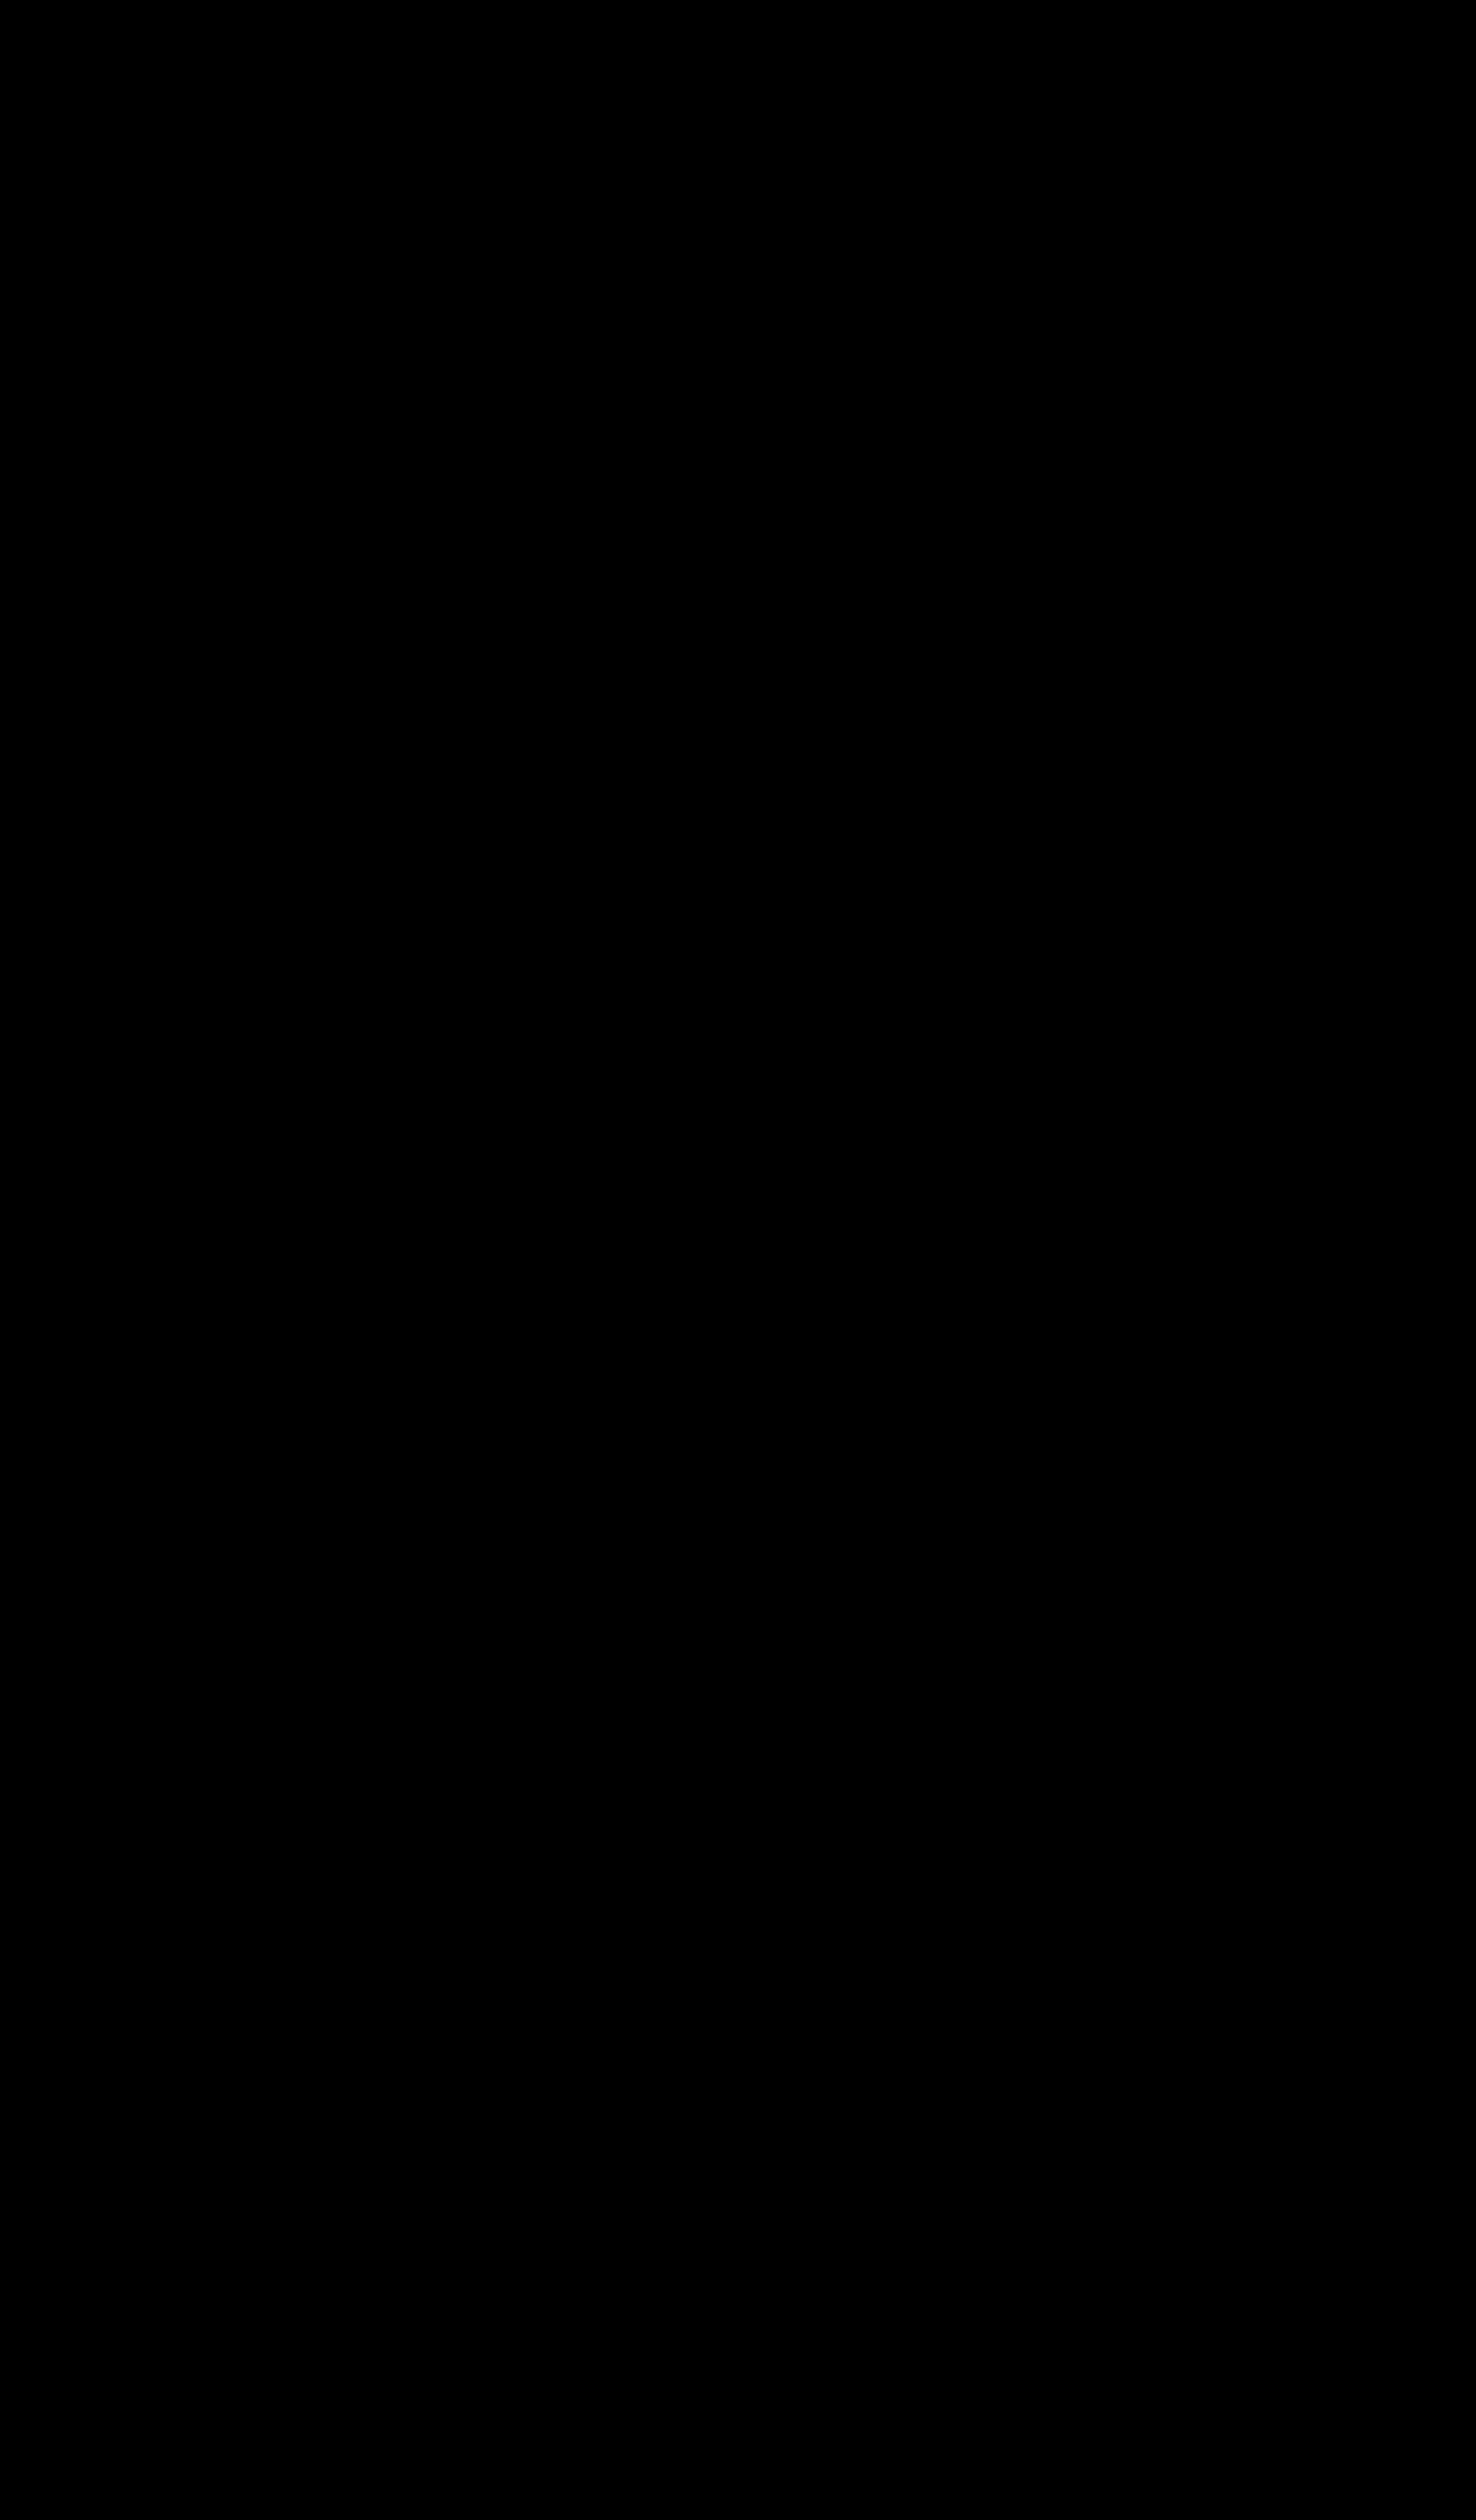 Flourish clipart file. B with svg wikimedia